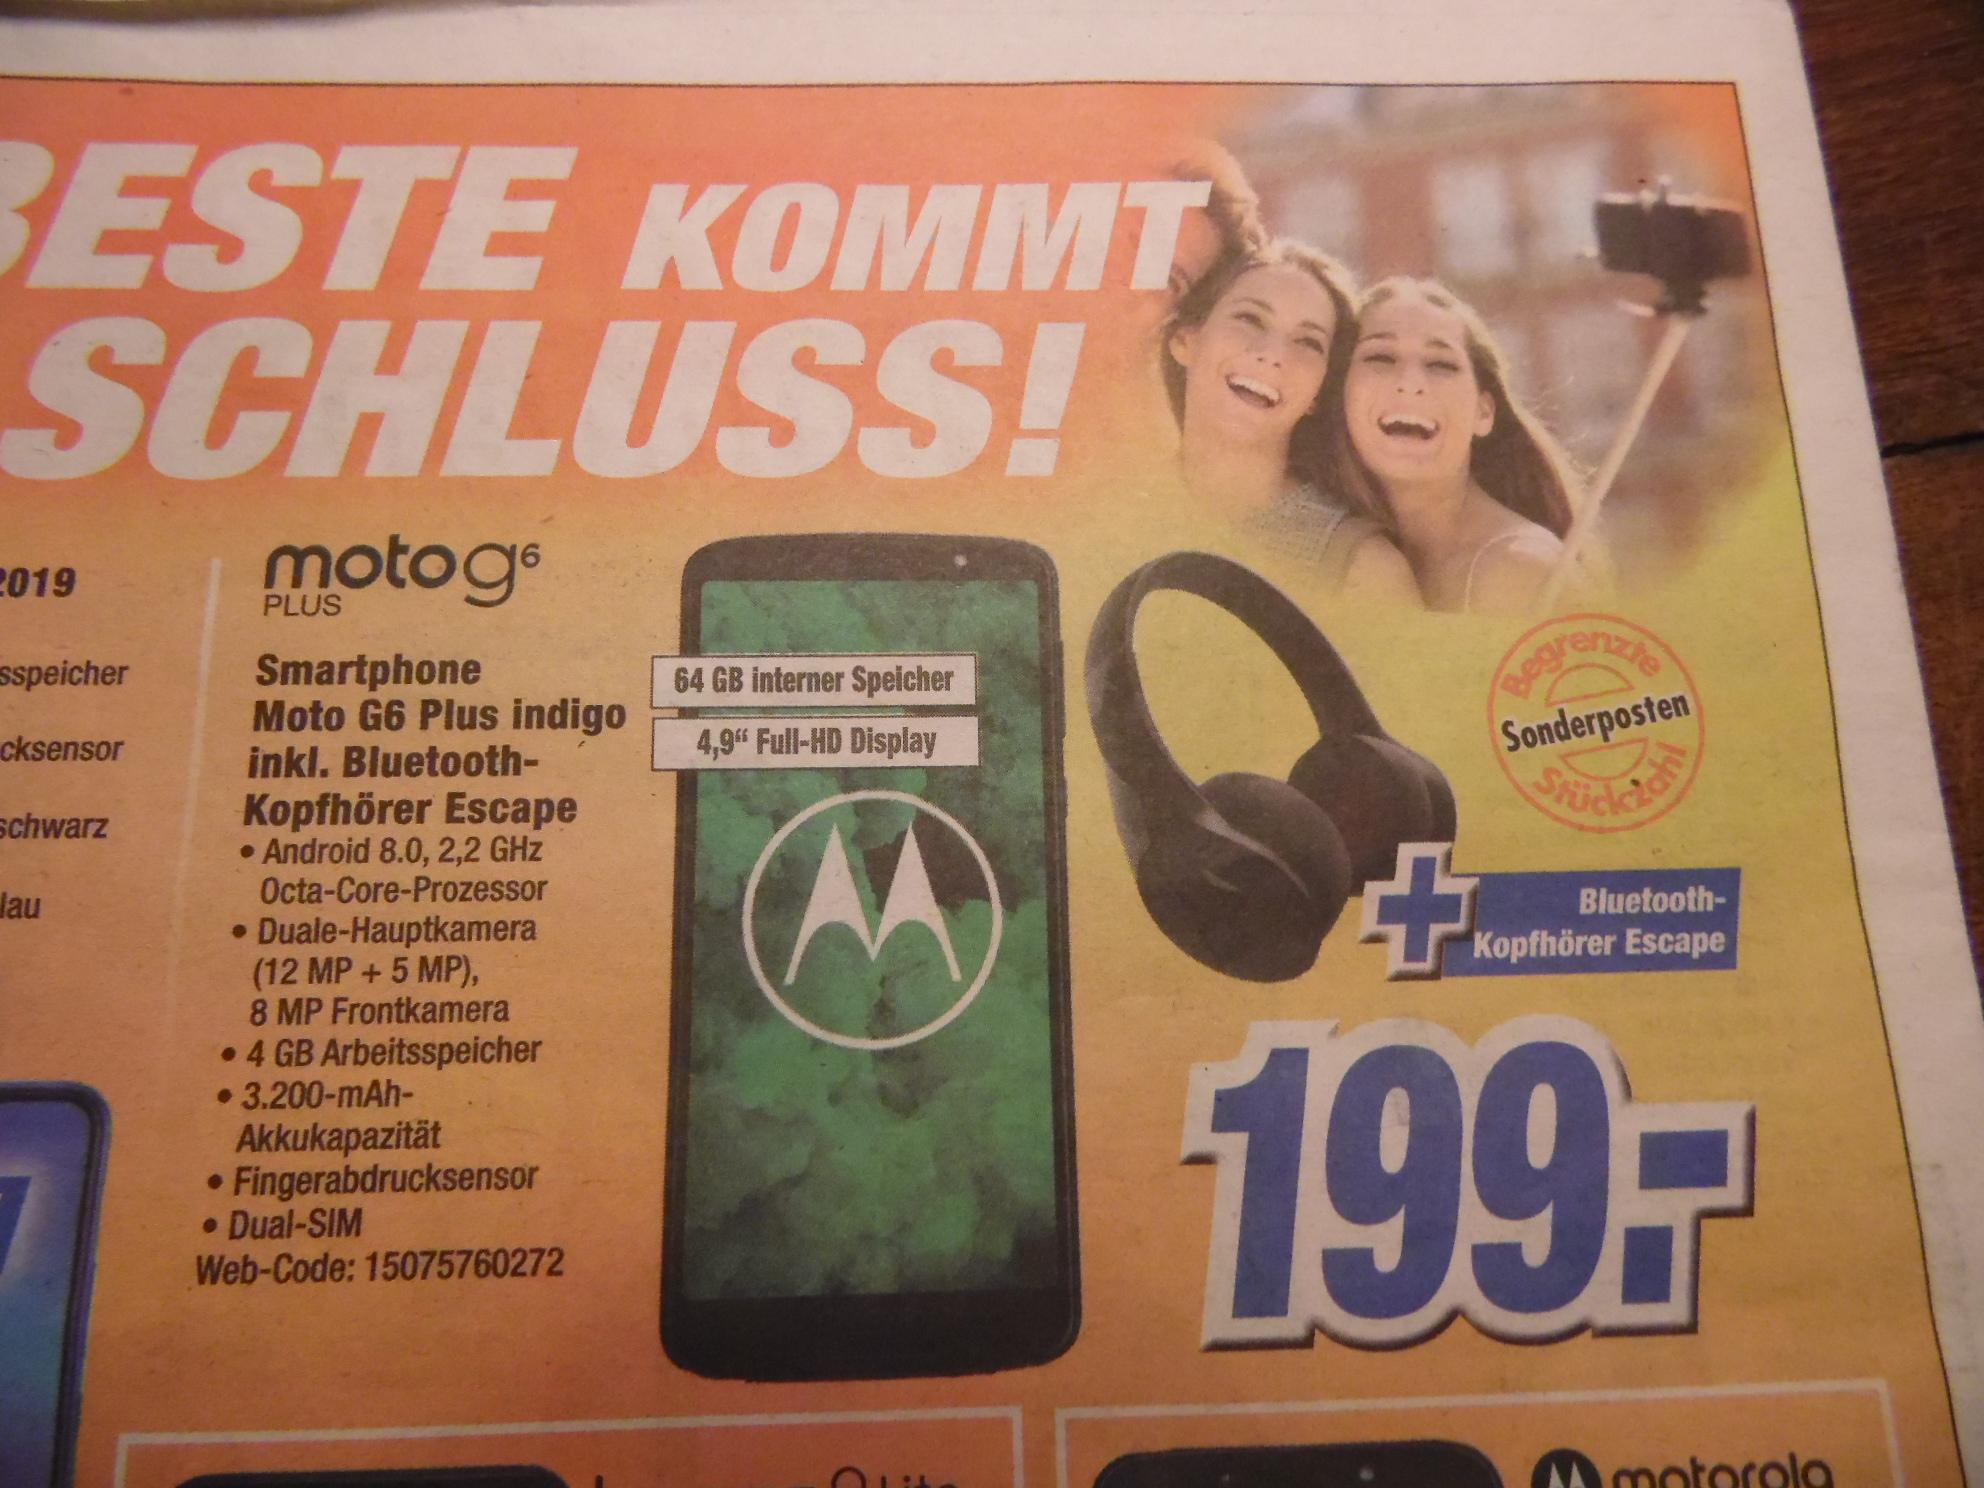 Lokal Bonn: Motorola Moto G6 Plus (5,9 FHD+, Dual Sim, 64/4 GB, 12/5/8 MP, 3200 mAh, Android 8) + Motorola Escape BT-Kopfhörer